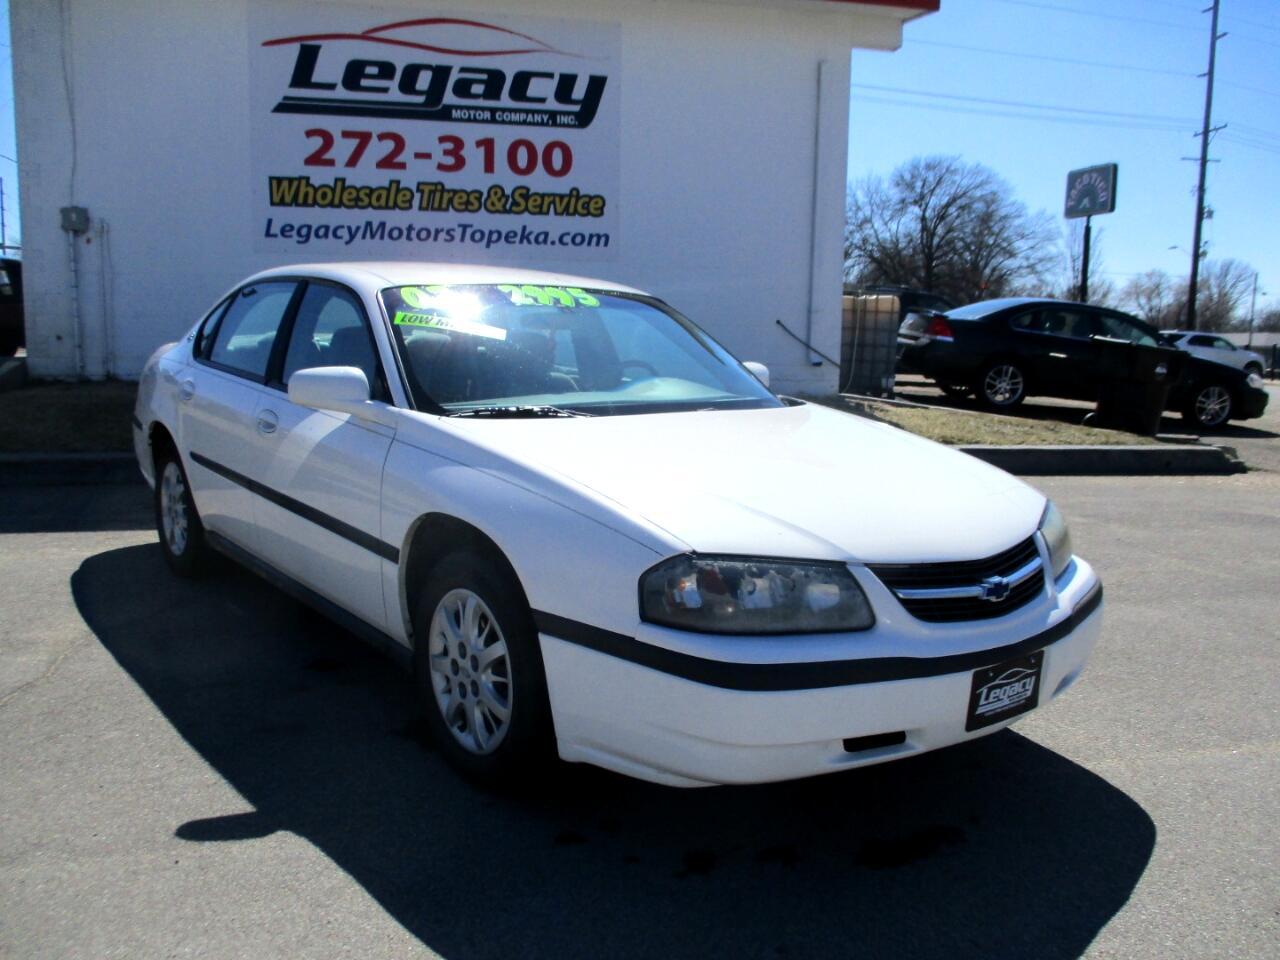 2002 Chevrolet Impala 4dr Sdn